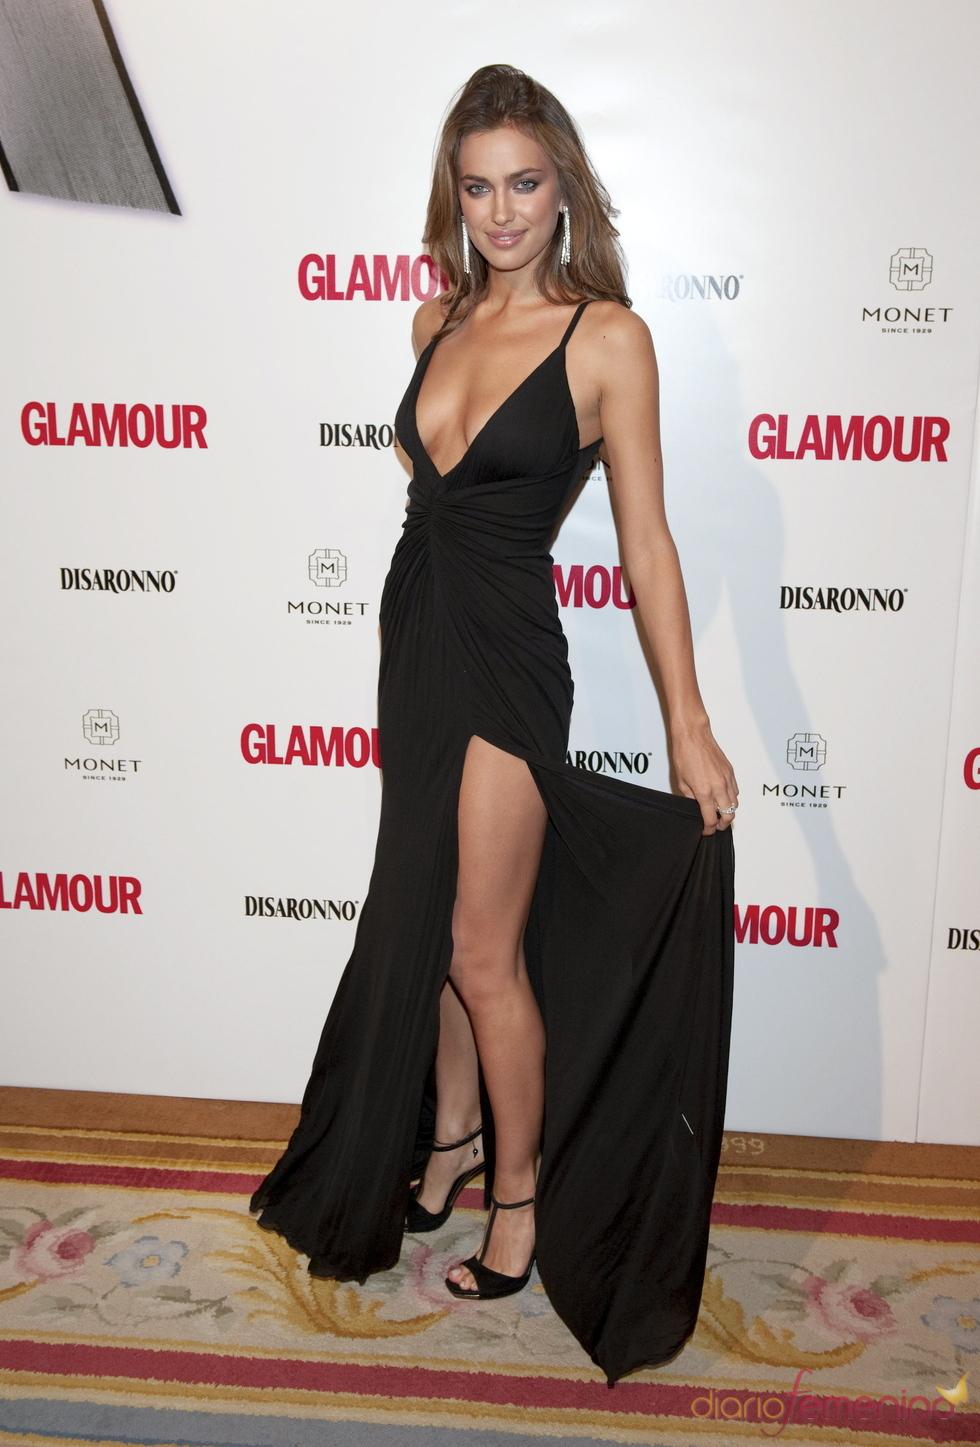 Premios Top Glamour 2010 con Irina Shayk